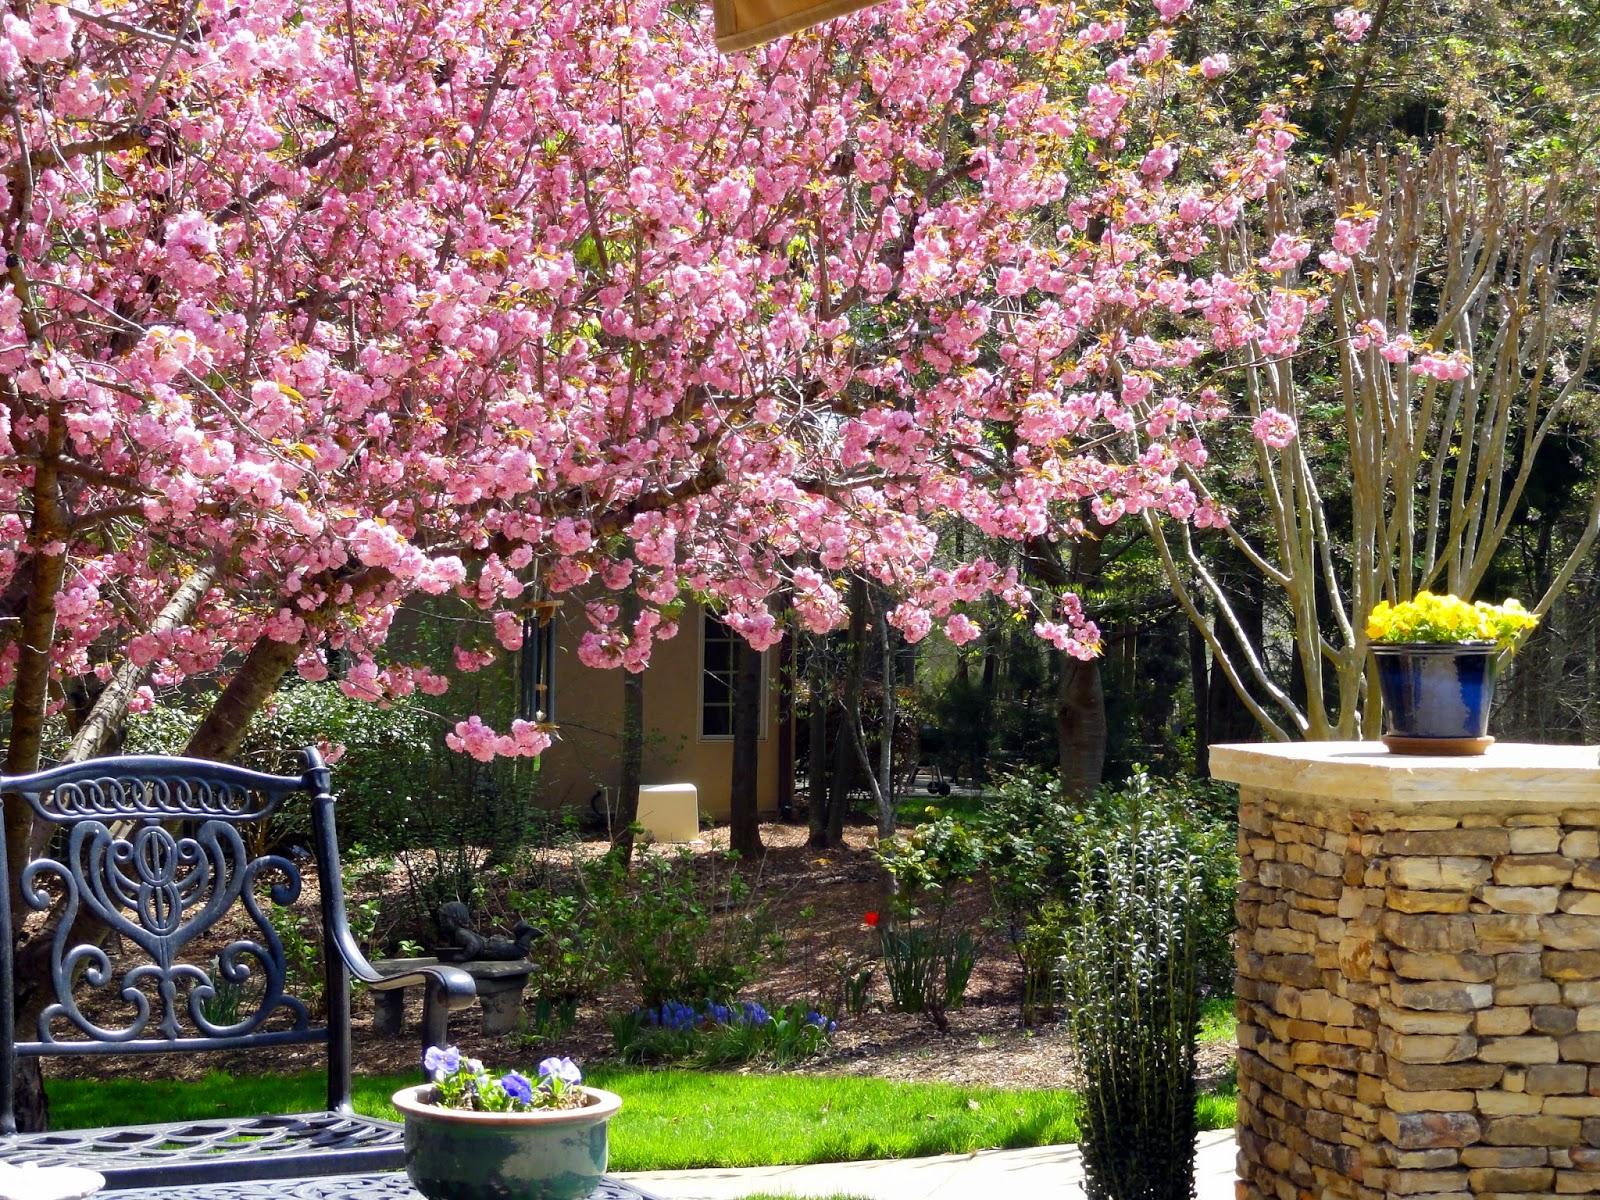 happy home strolling through the spring garden